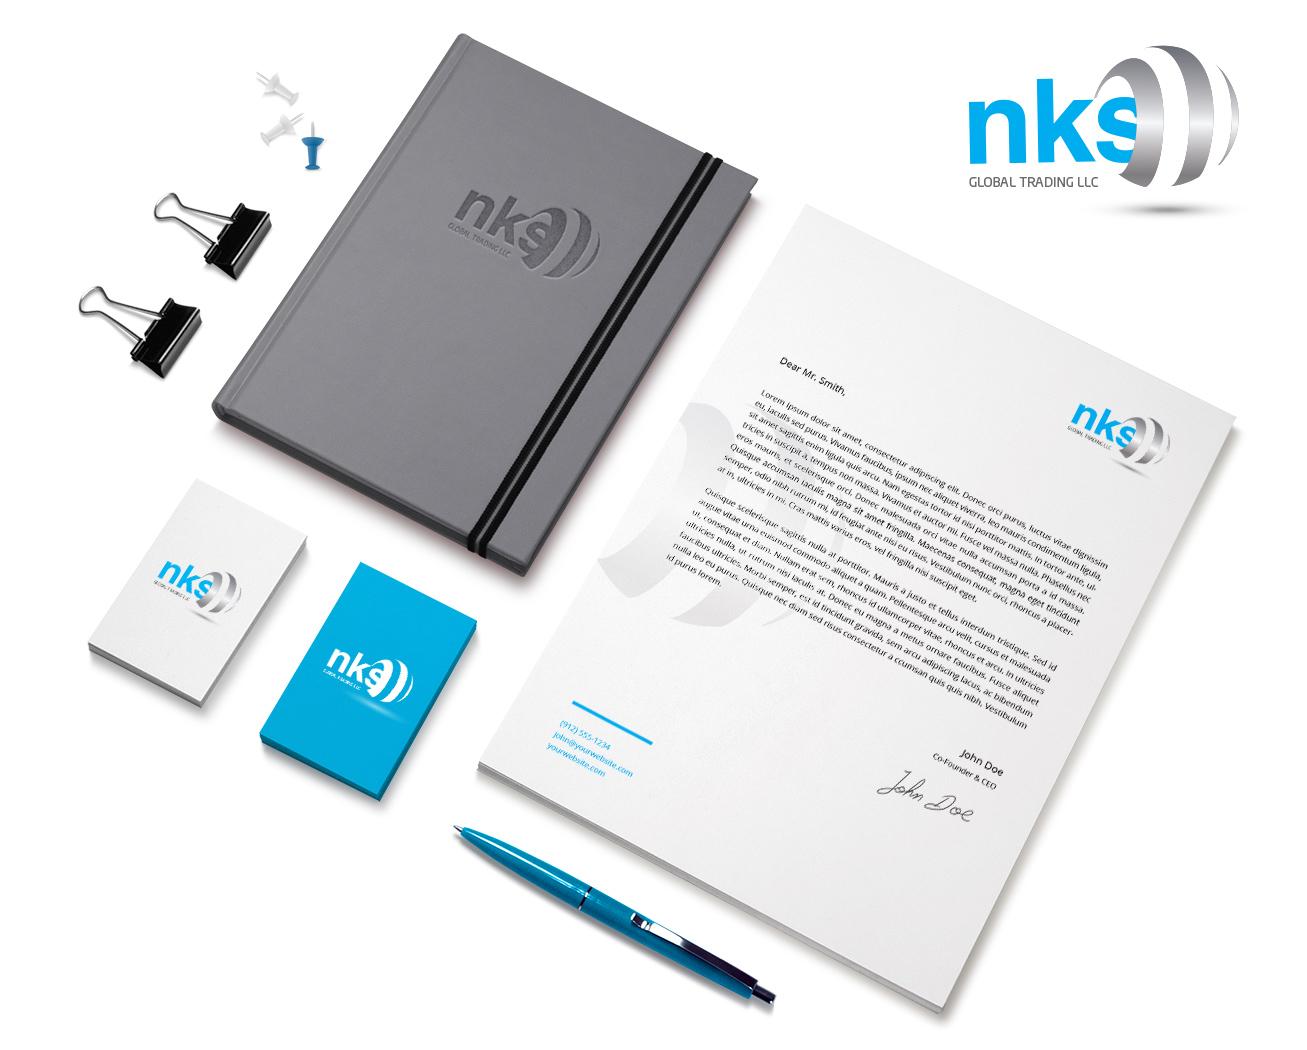 nks - global trading identity